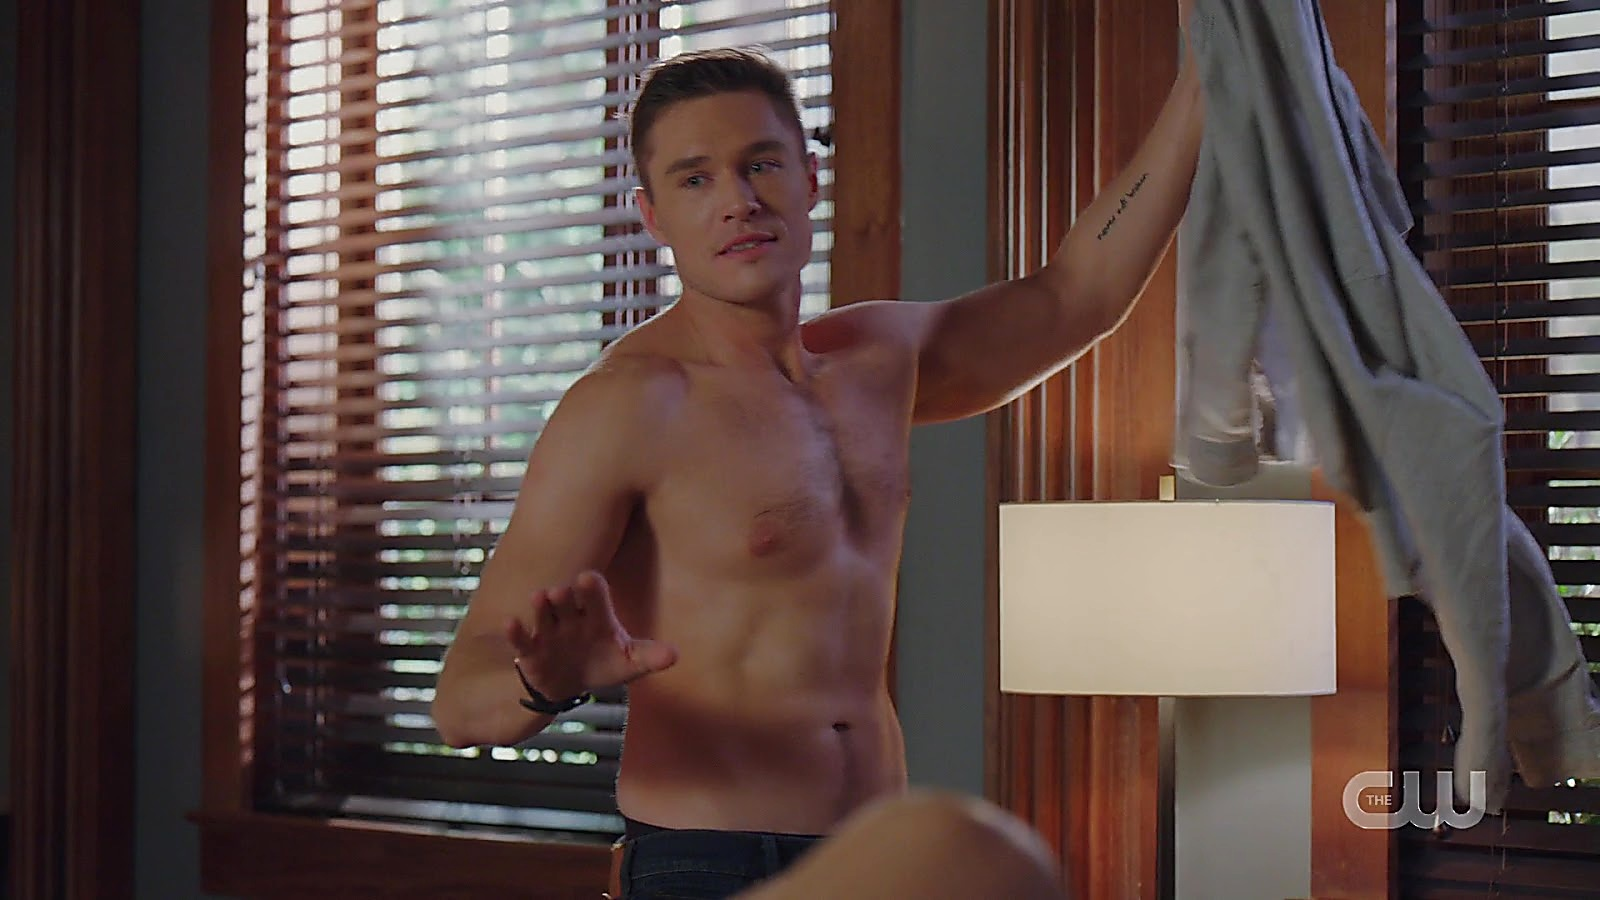 Sam Underwood sexy shirtless scene February 22, 2020, 8am